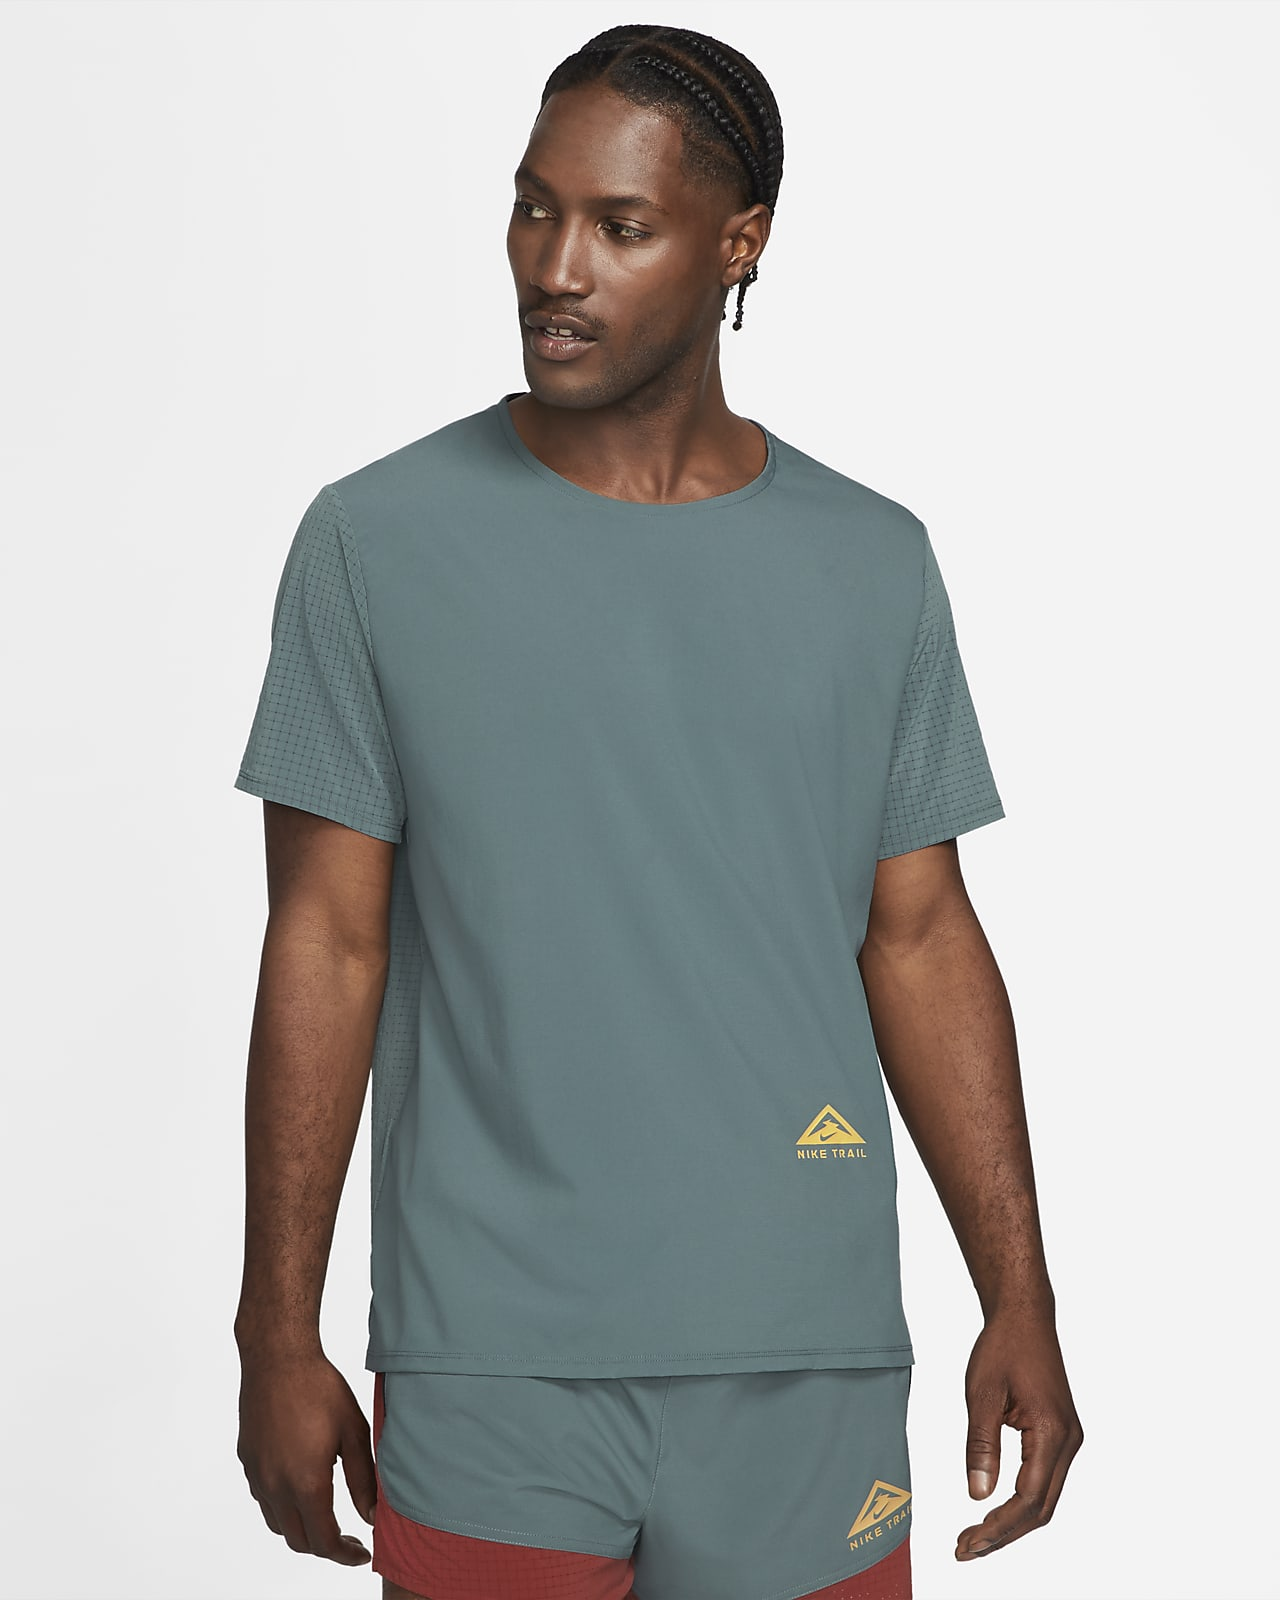 Běžecké tričko do terénu Nike Dri-FIT Rise 365 skrátkým rukávem